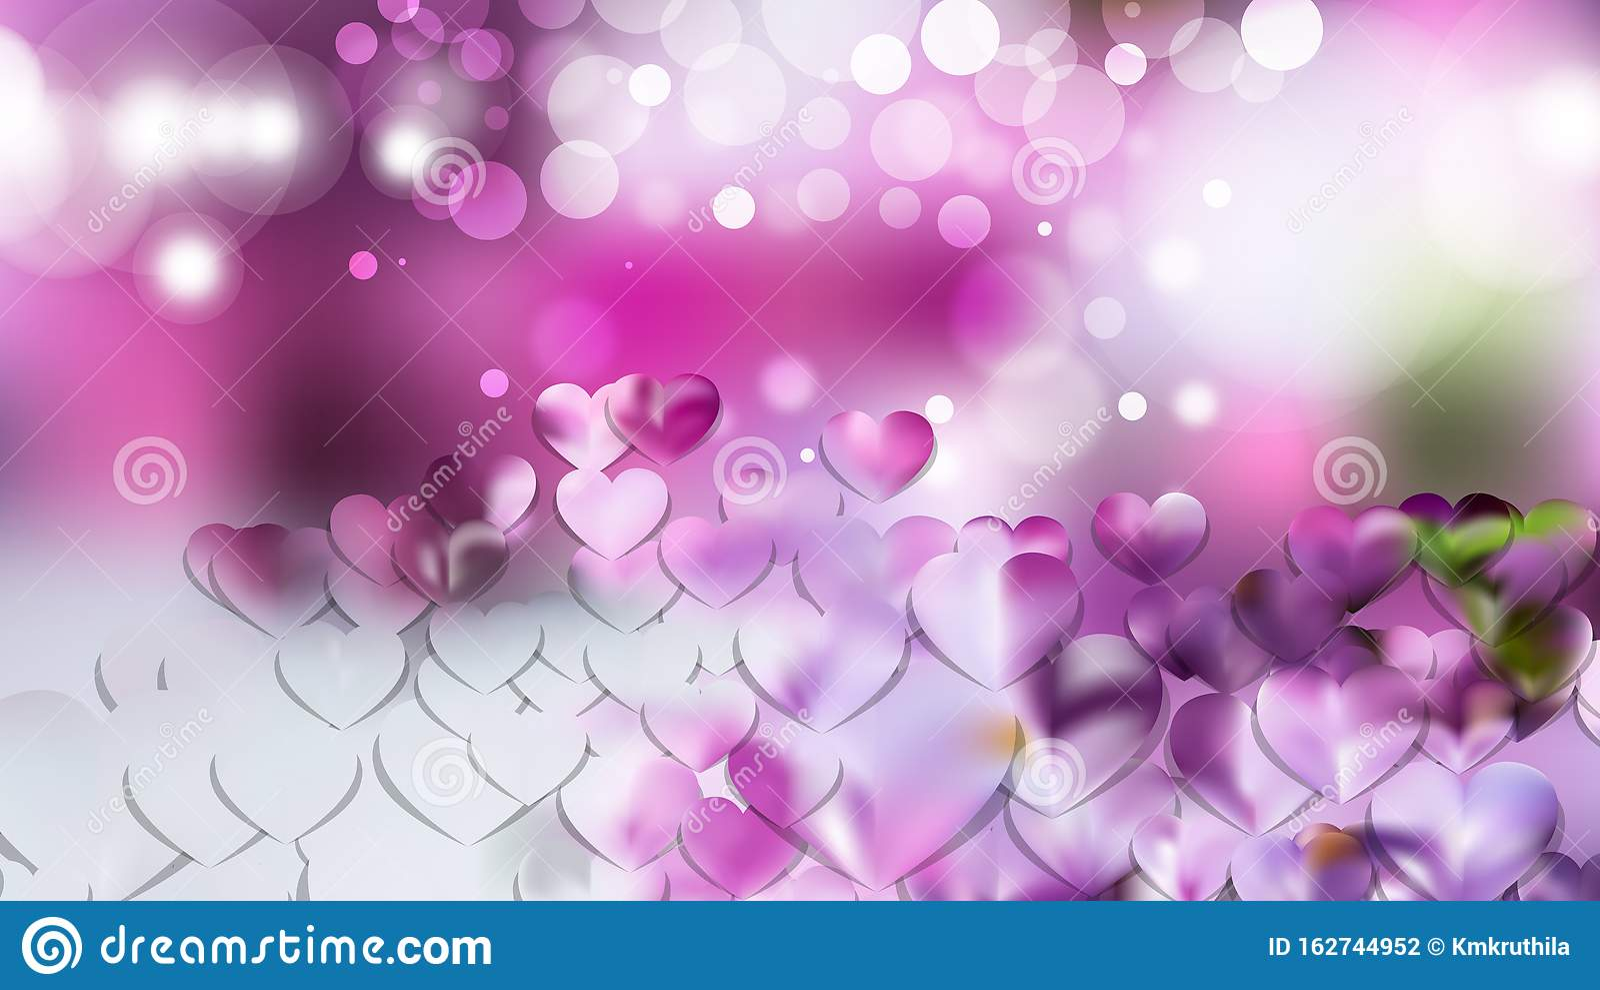 light purple heart wallpaper background 162744952